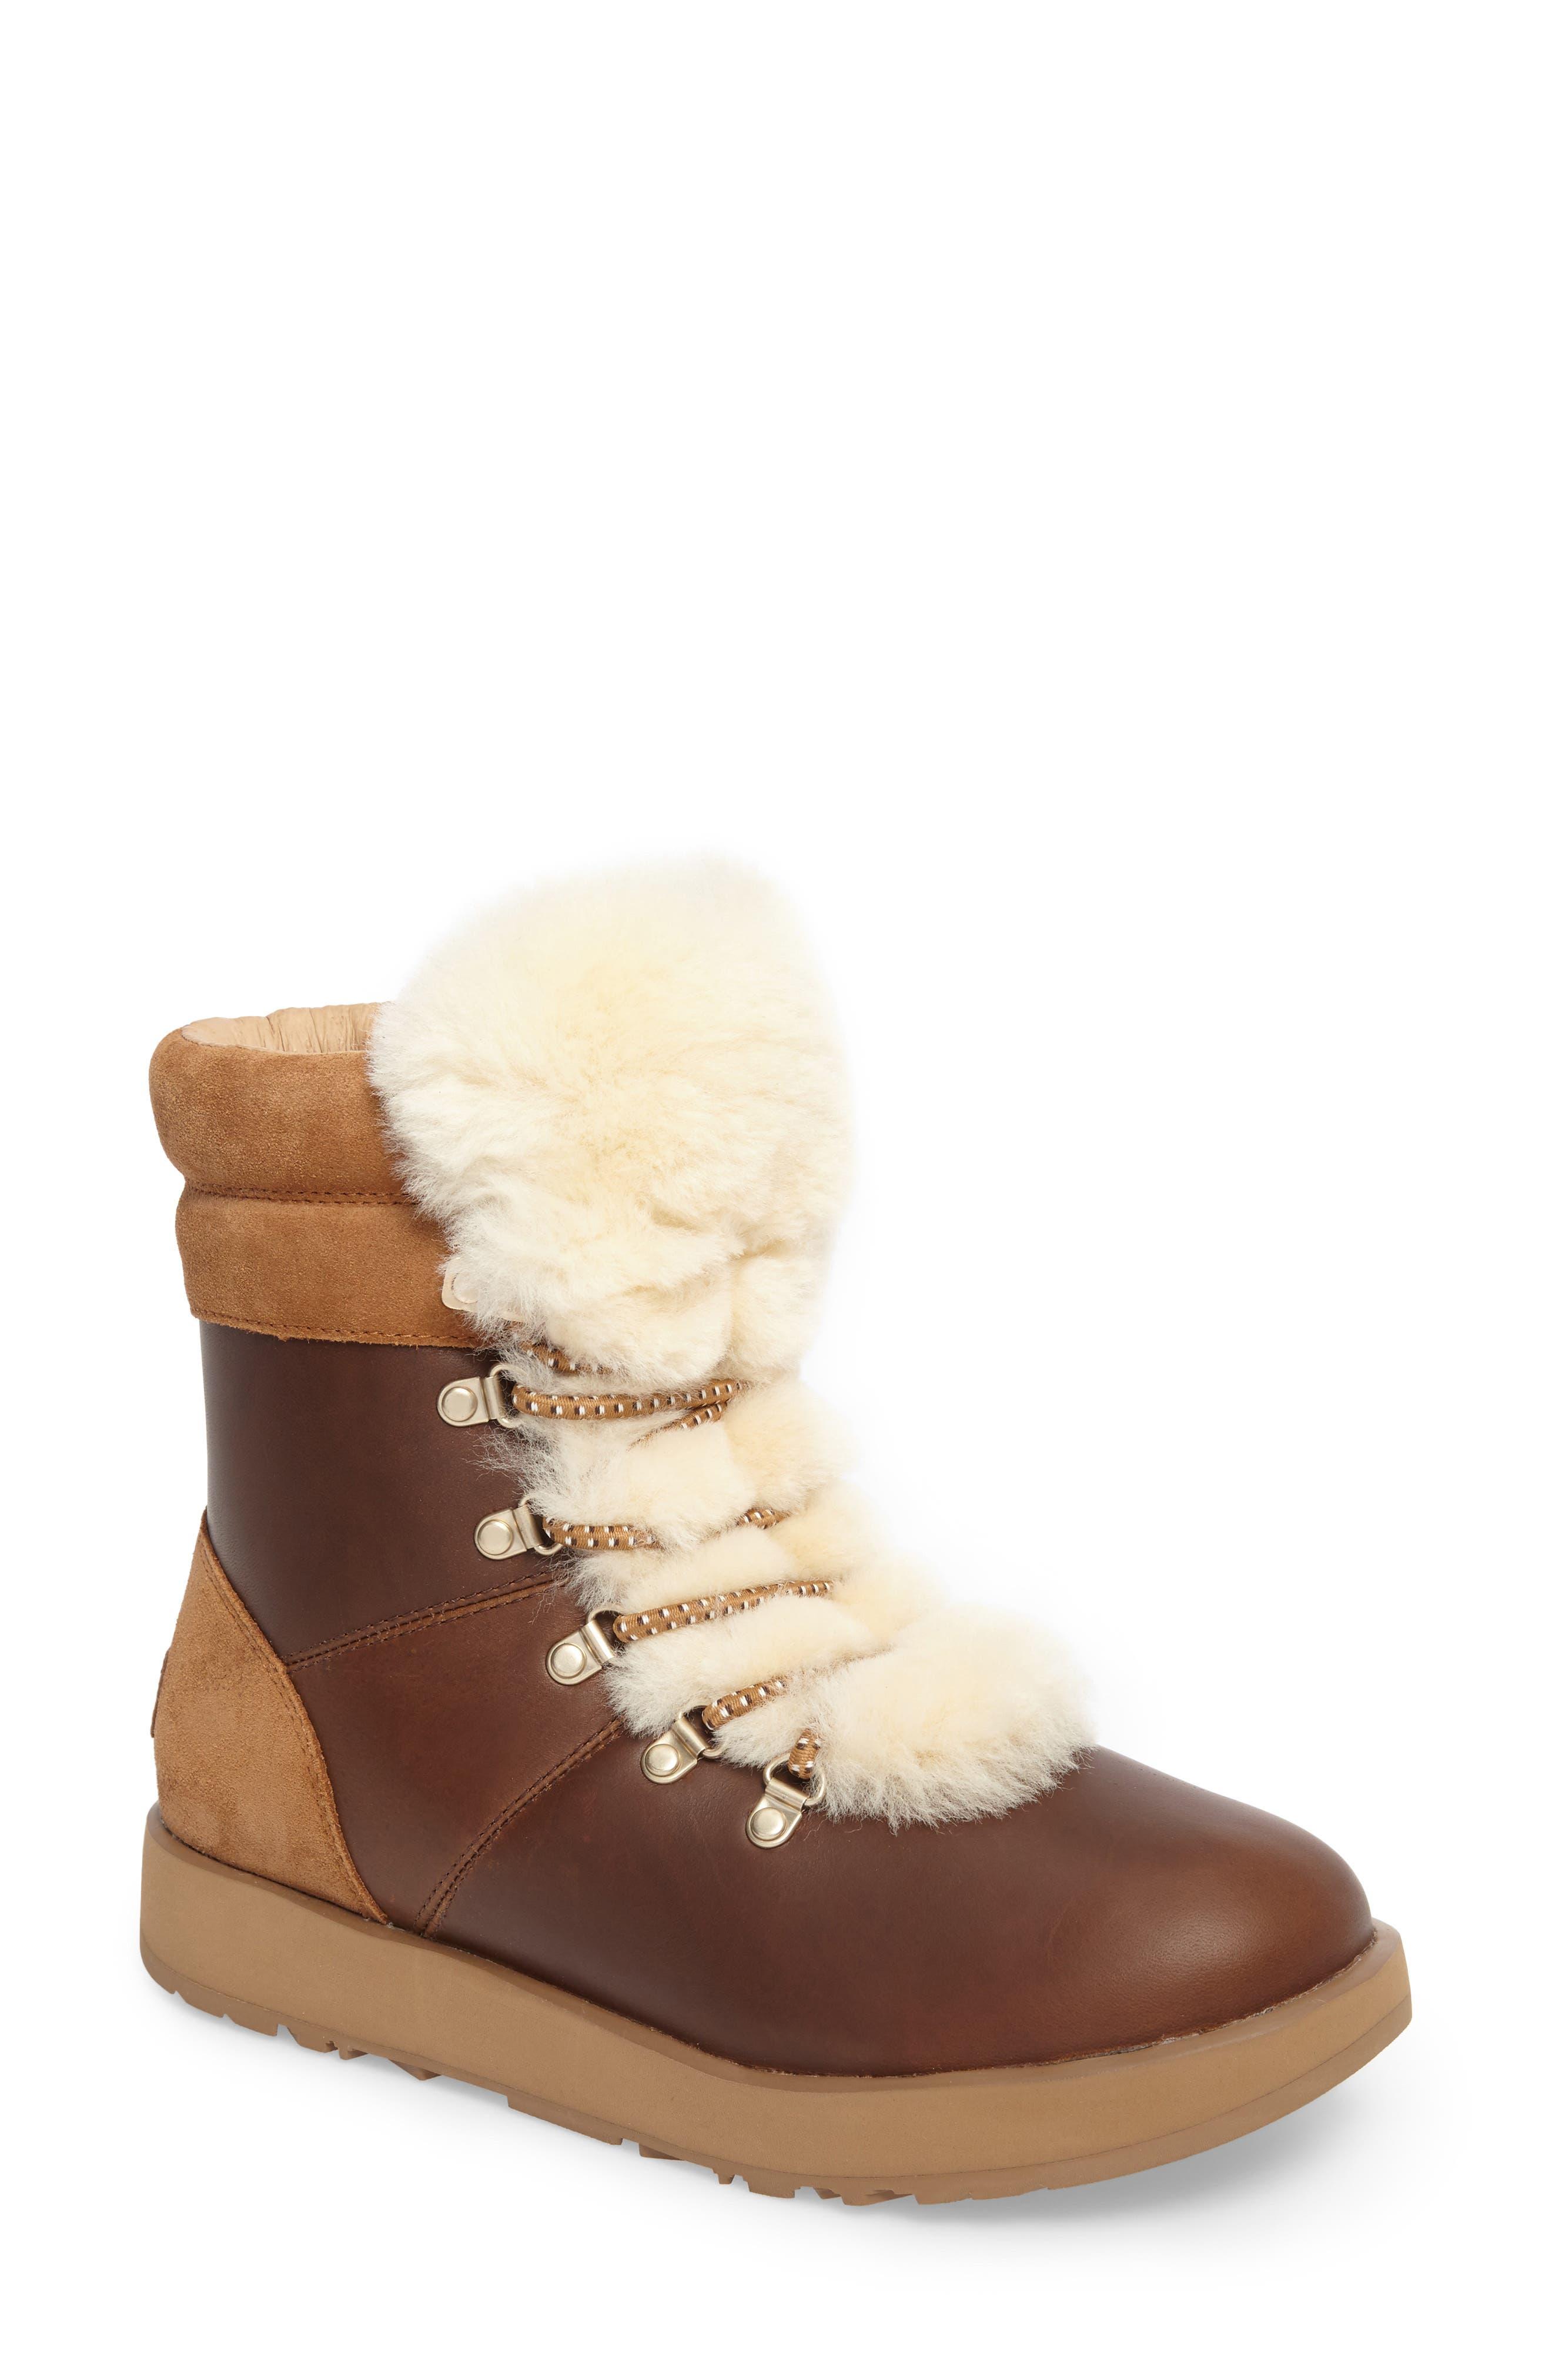 Alternate Image 1 Selected - UGG® Viki Waterproof Boot (Women)